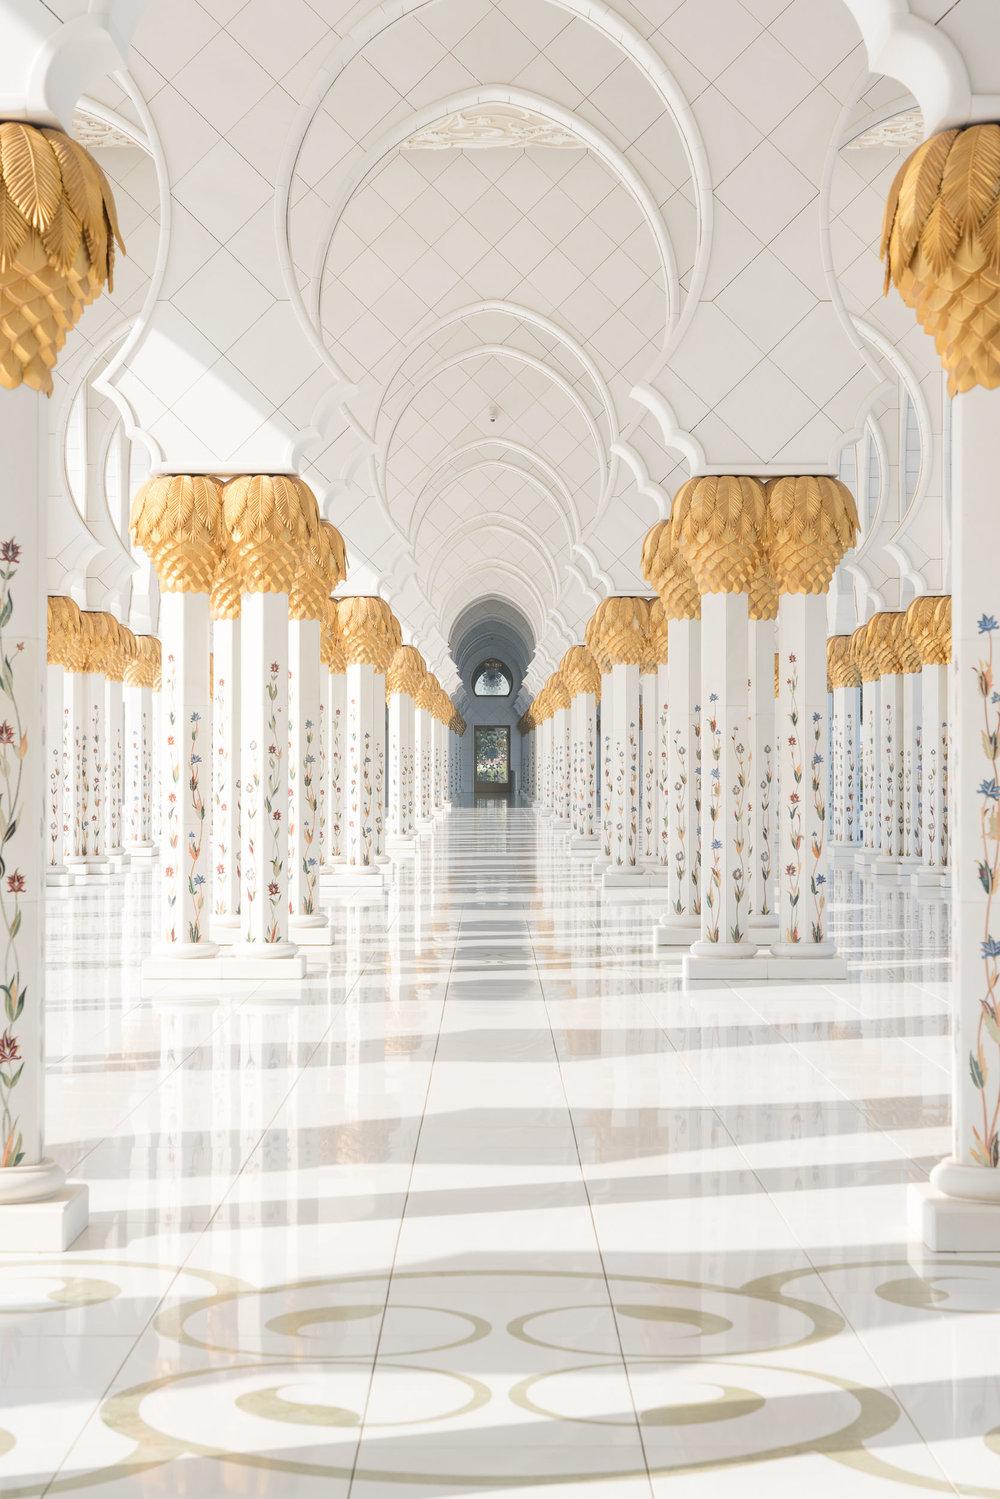 the_getaway_edit_abu_dhabi_sheikh_zayed_grand_mosque-4.jpg